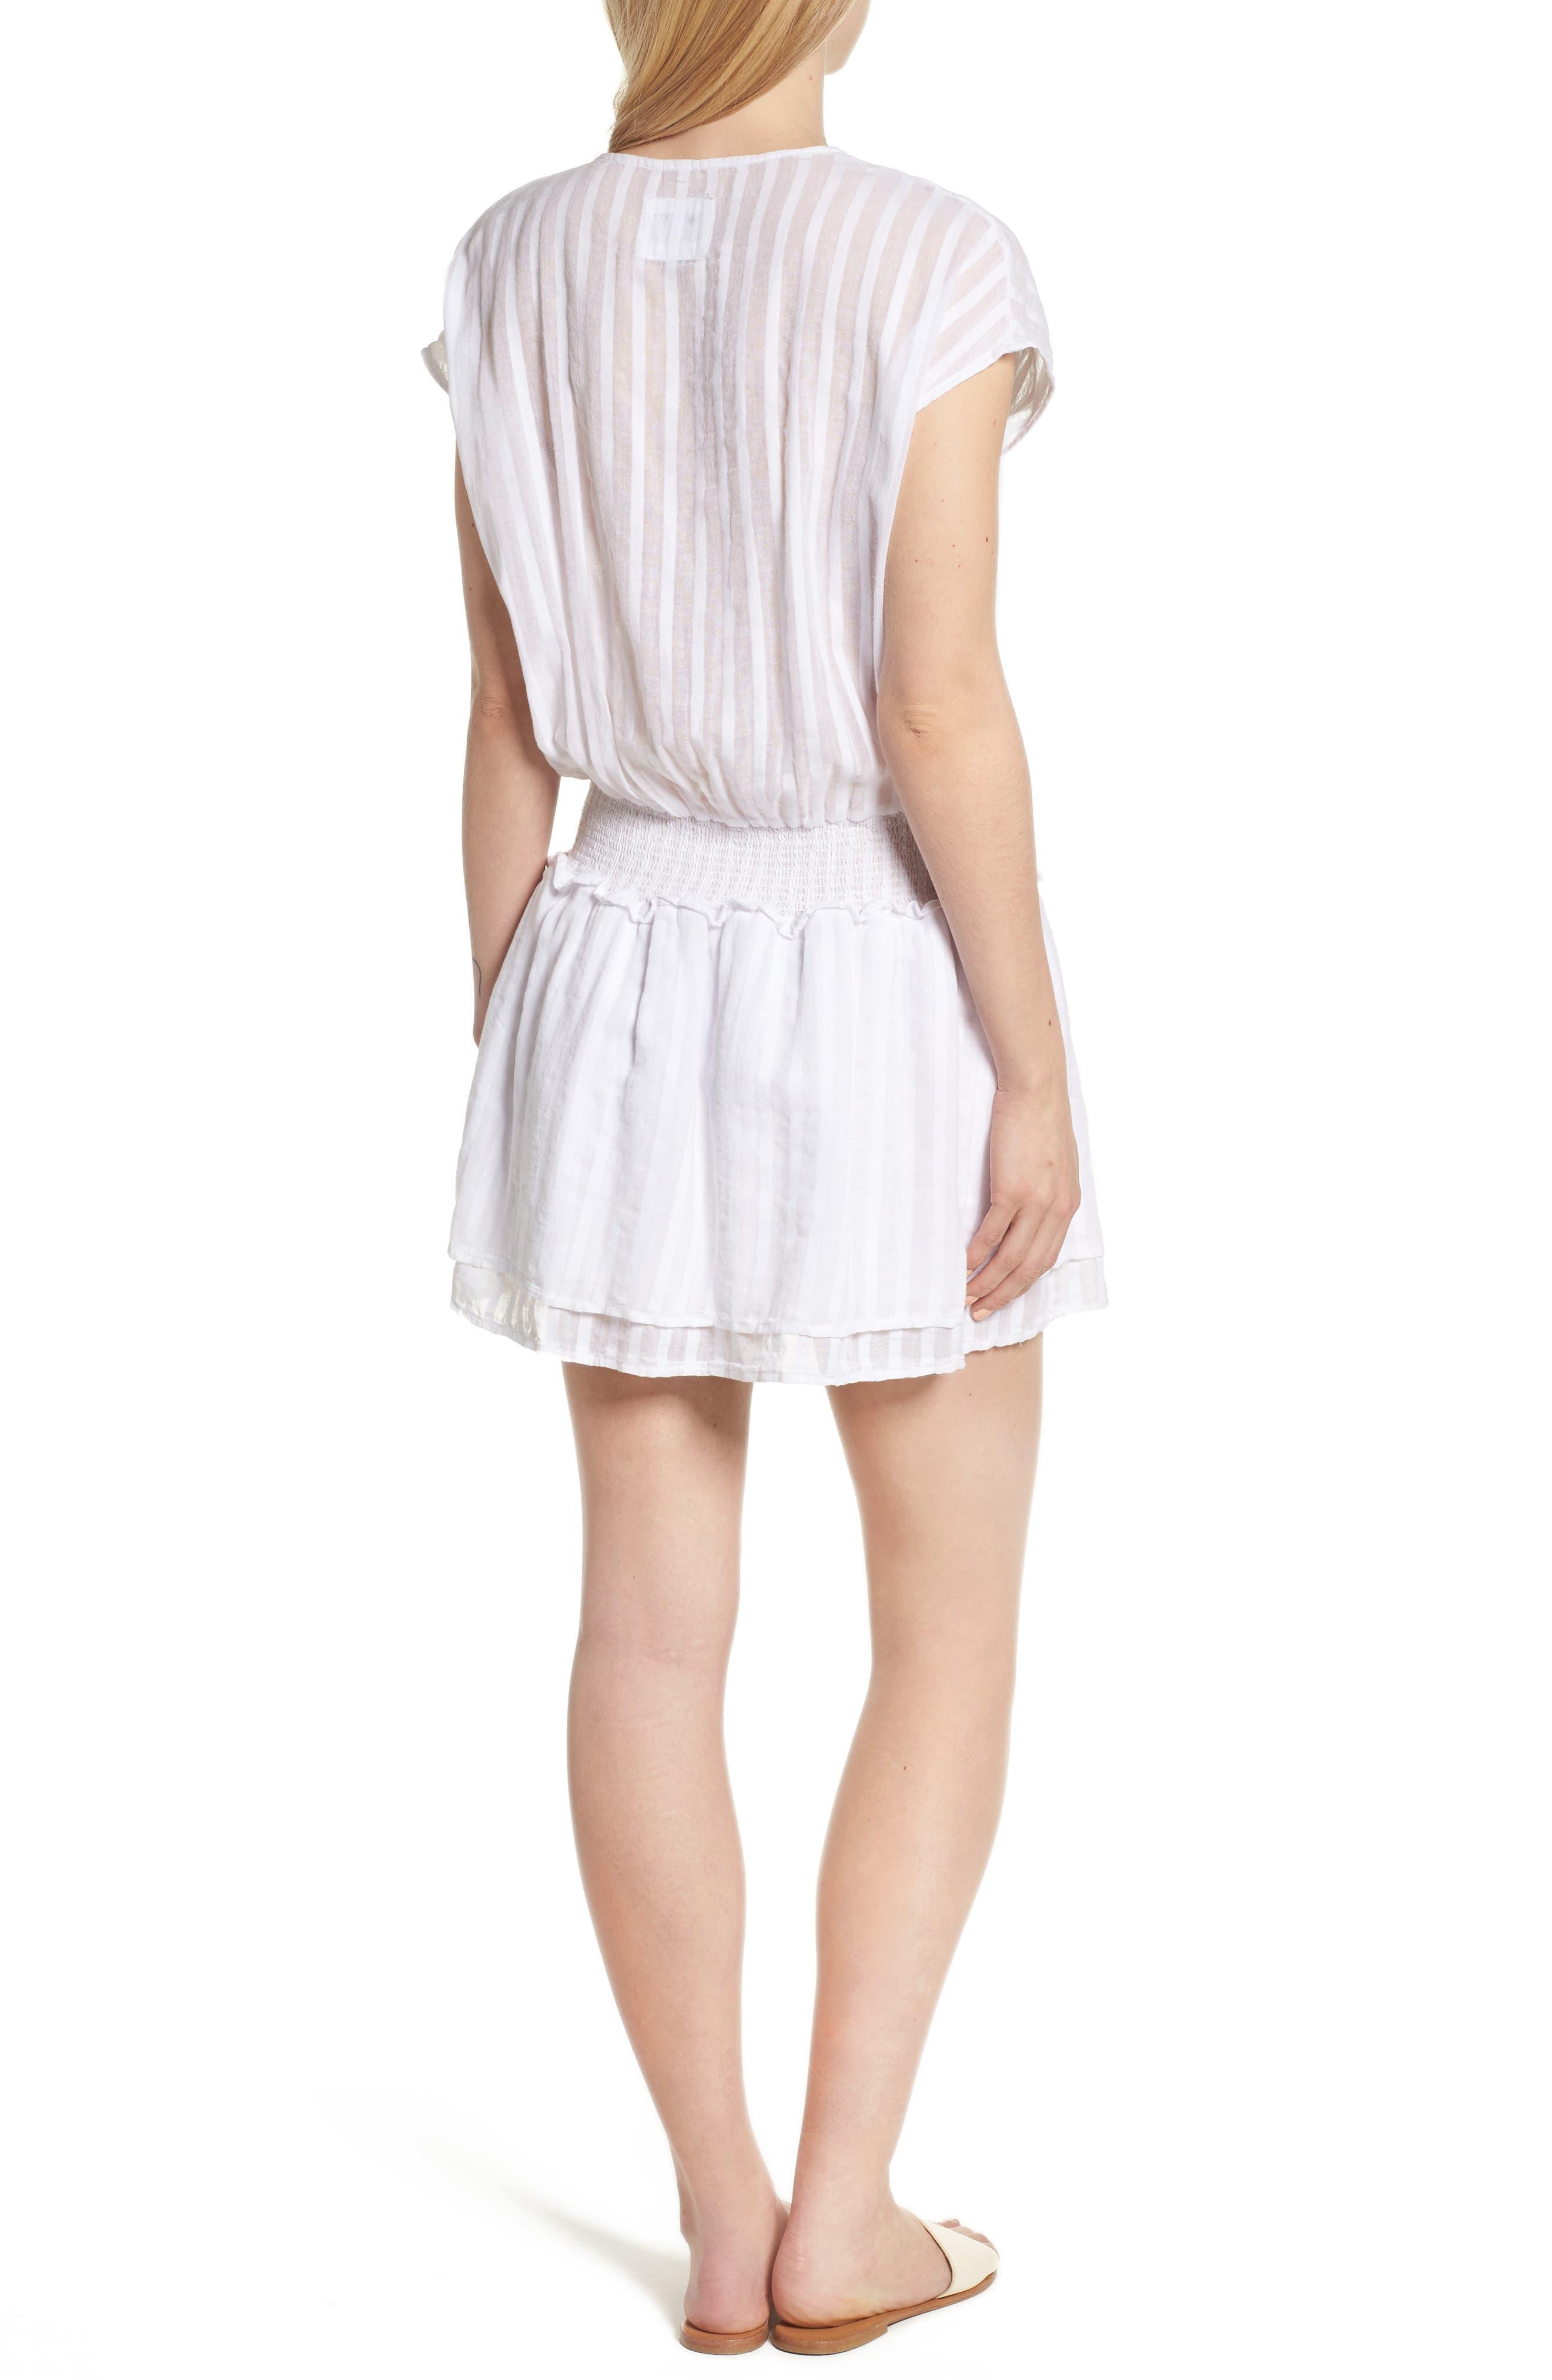 Lucca Blouson Cotton Dress,                             Alternate thumbnail 2, color,                             WHITE SHADOW STRIPE